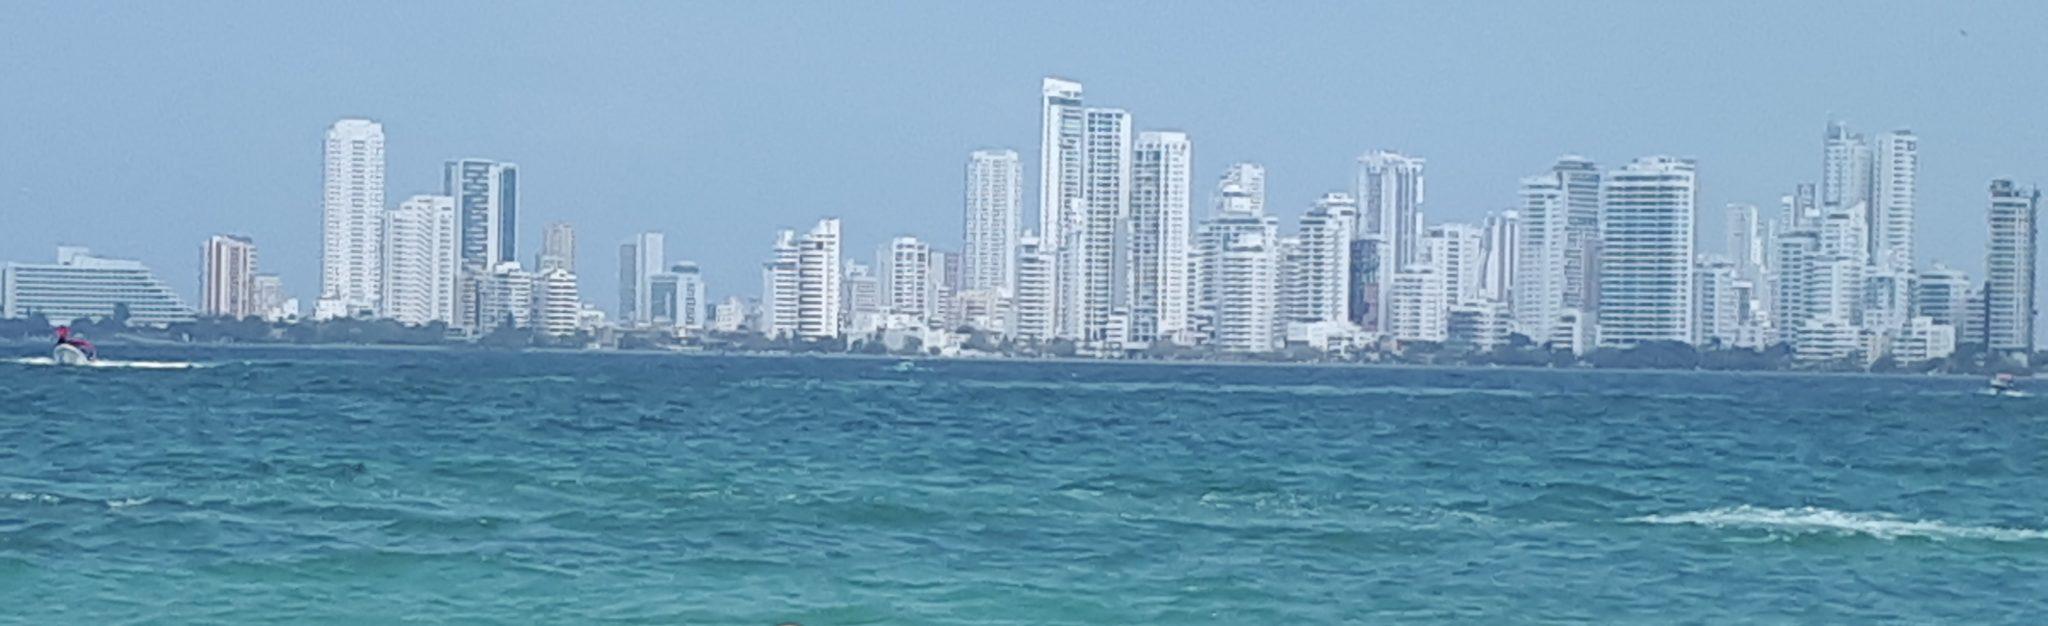 La Joya Hotelera de Cartagena